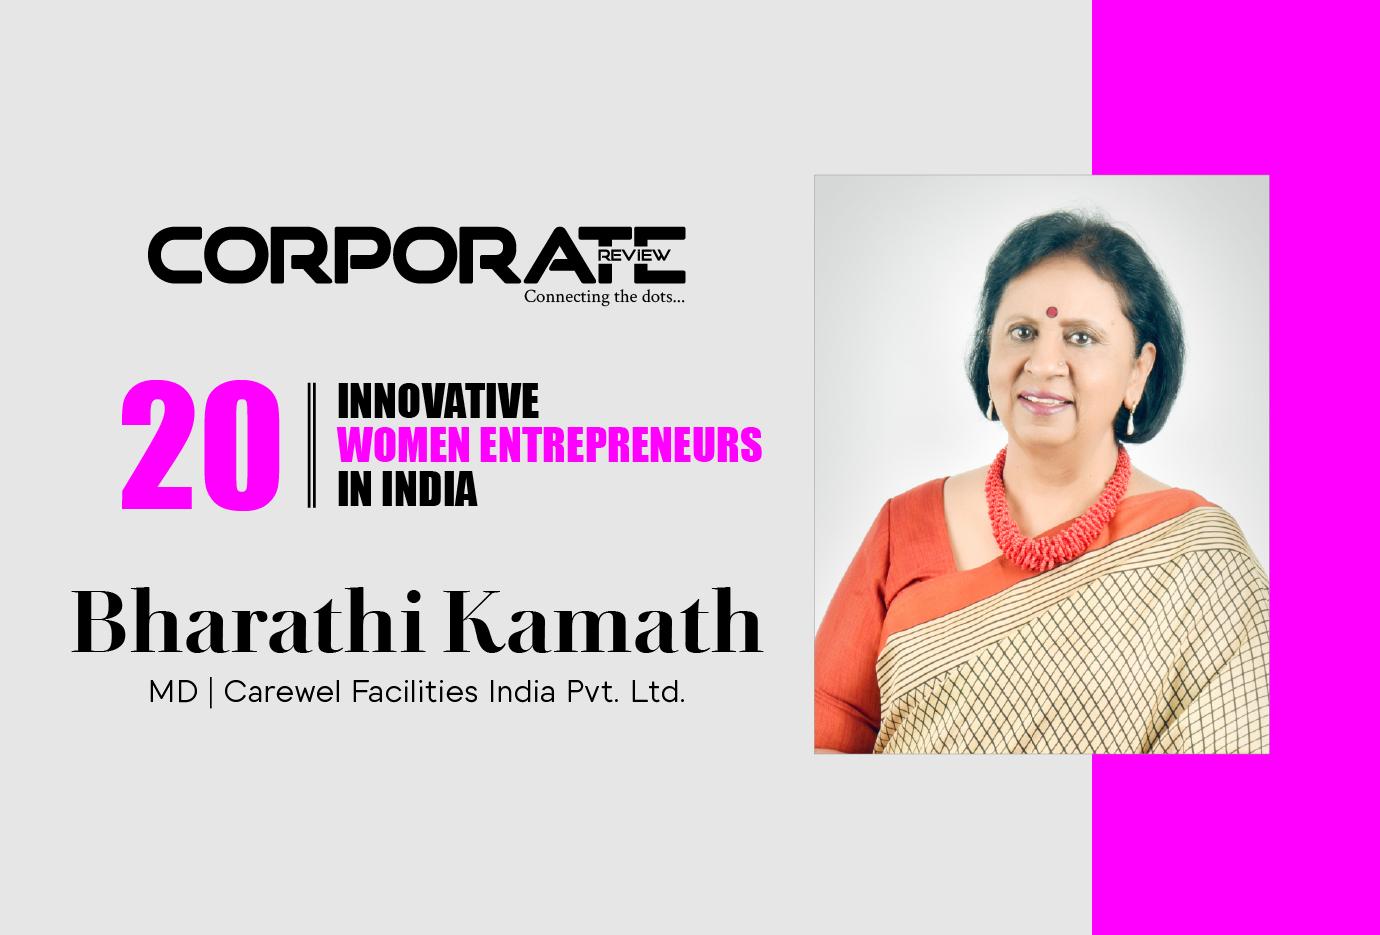 Bharathi Kamath: MD- Carewel Facilities India Pvt. Ltd.